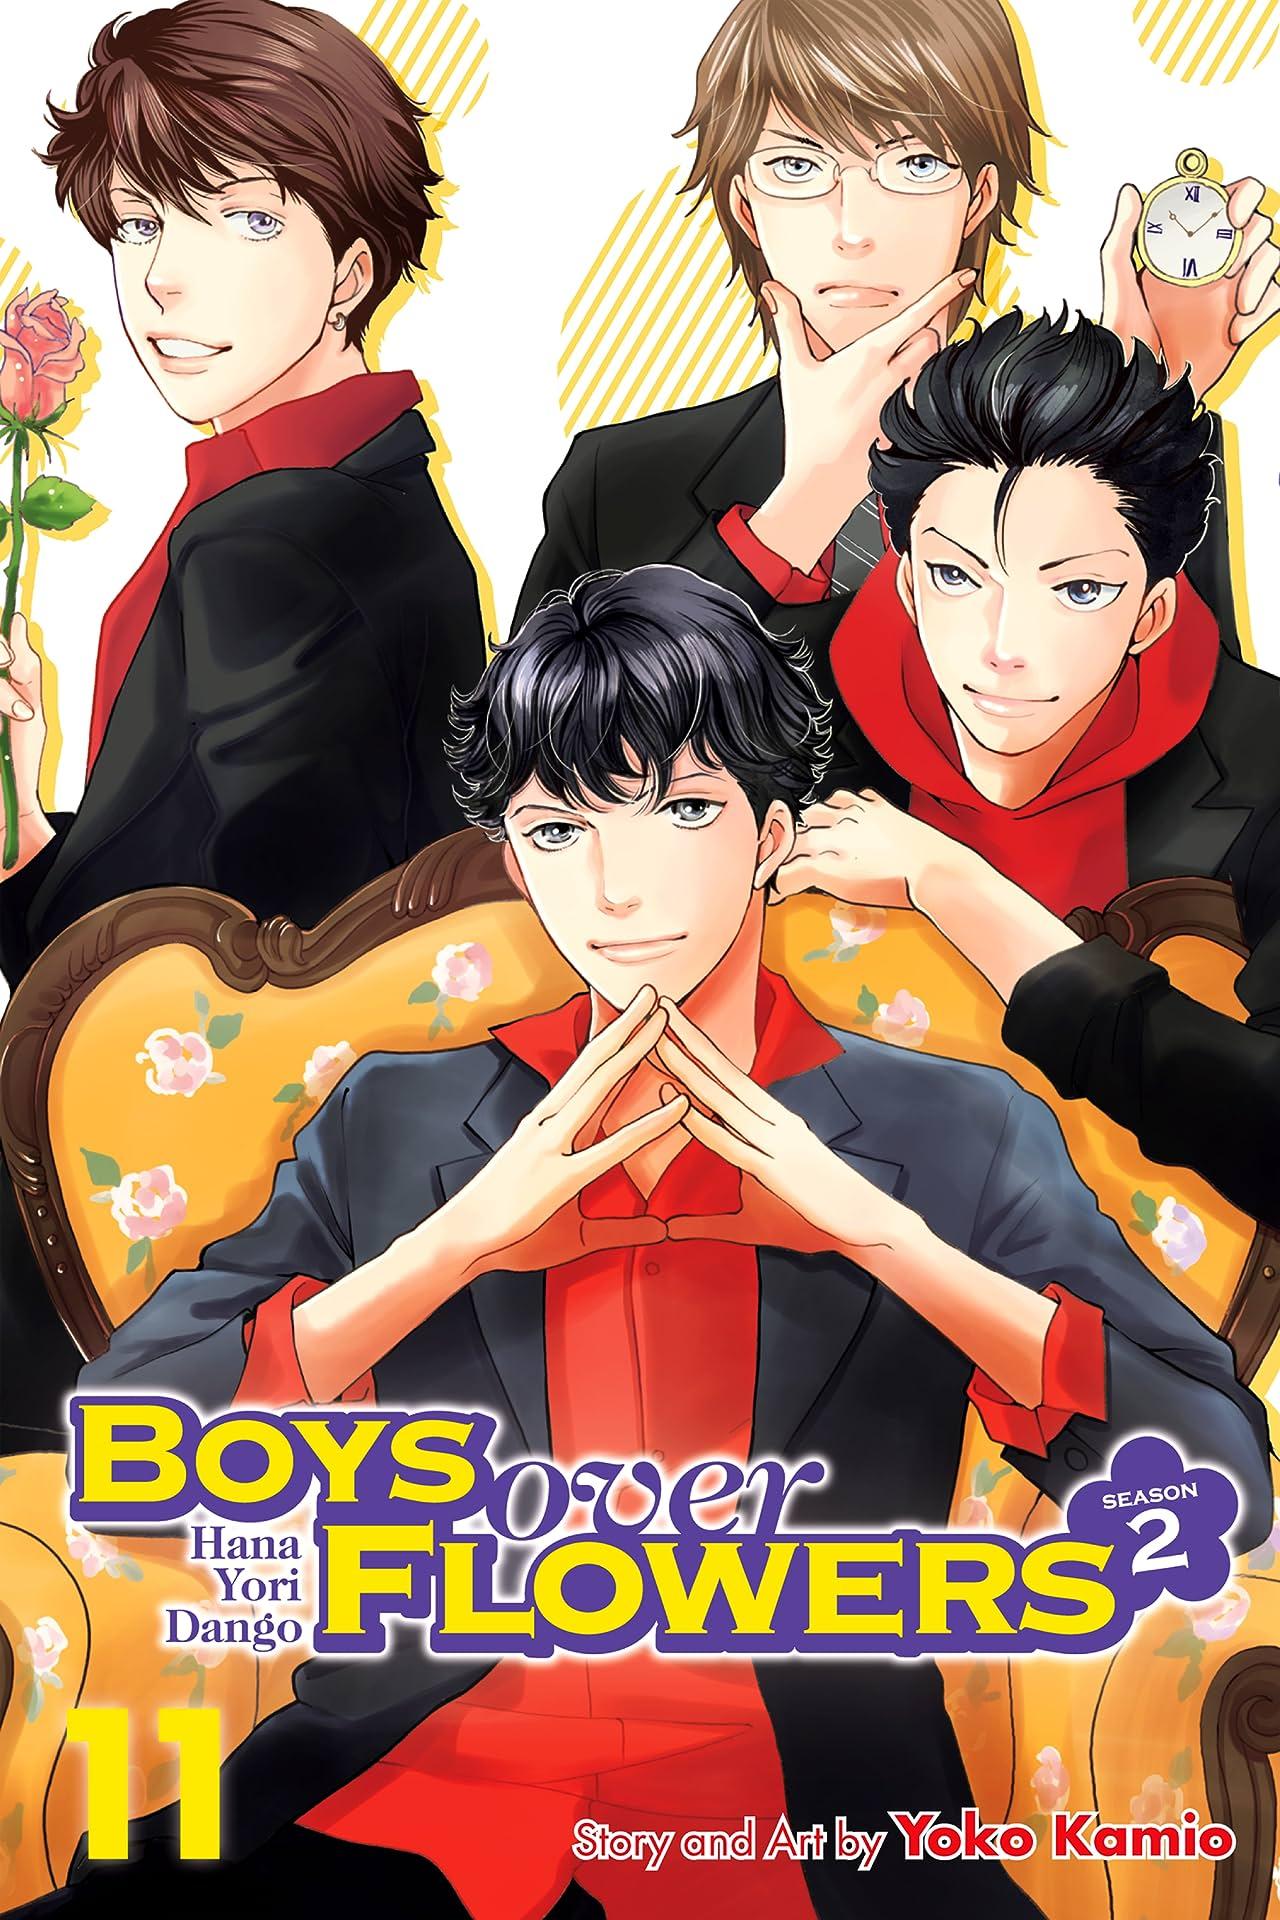 Boys Over Flowers Season 2 Vol. 11